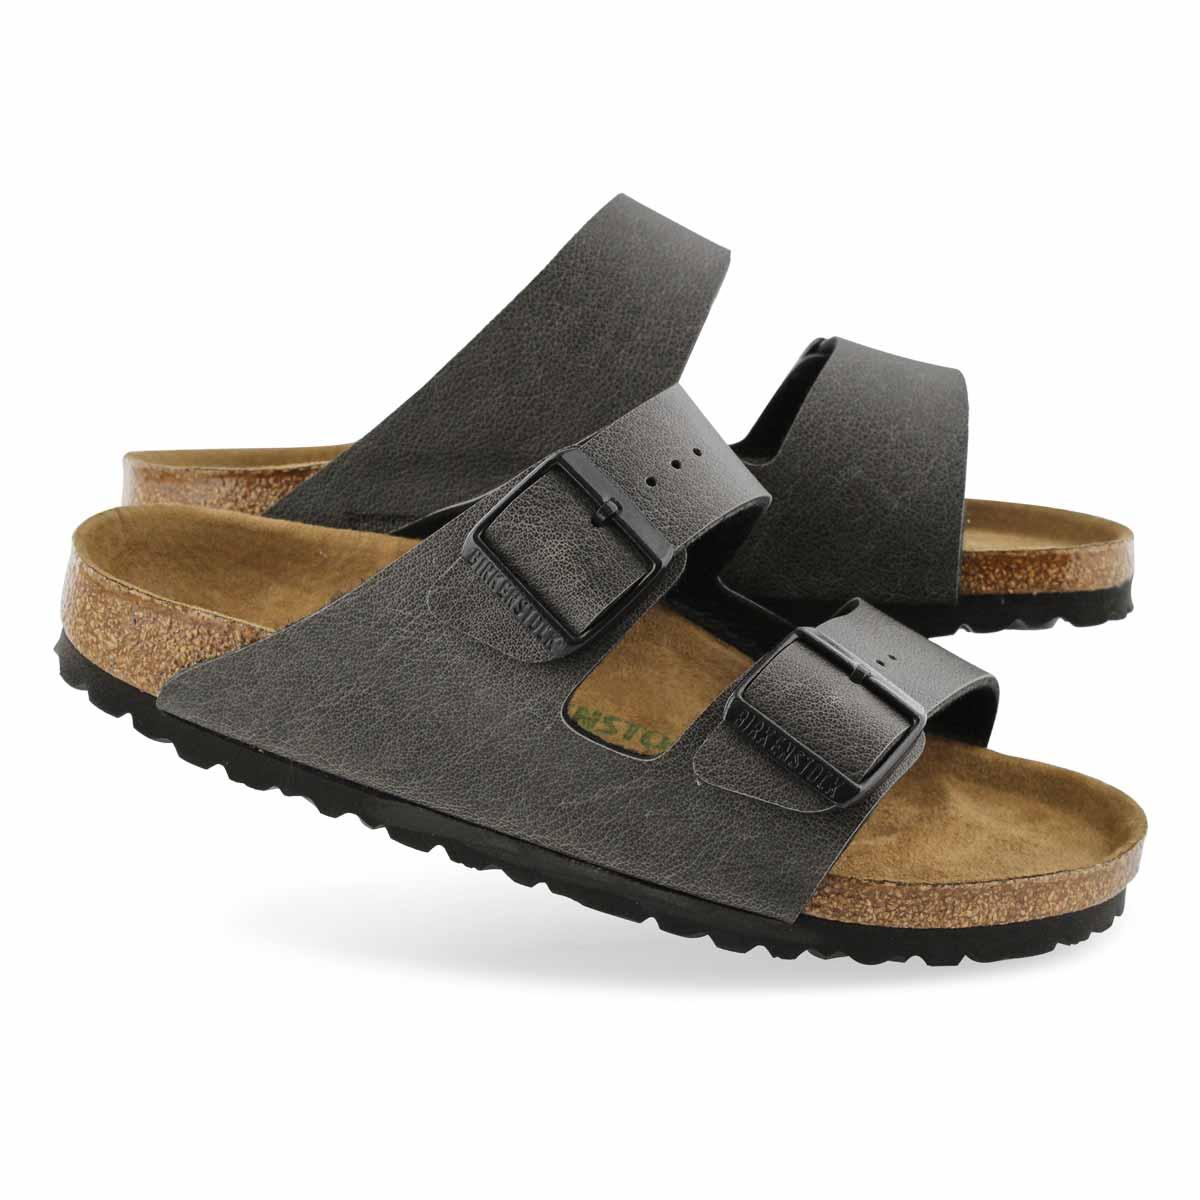 Lds Arizona Vegan anthrcite slide sandal